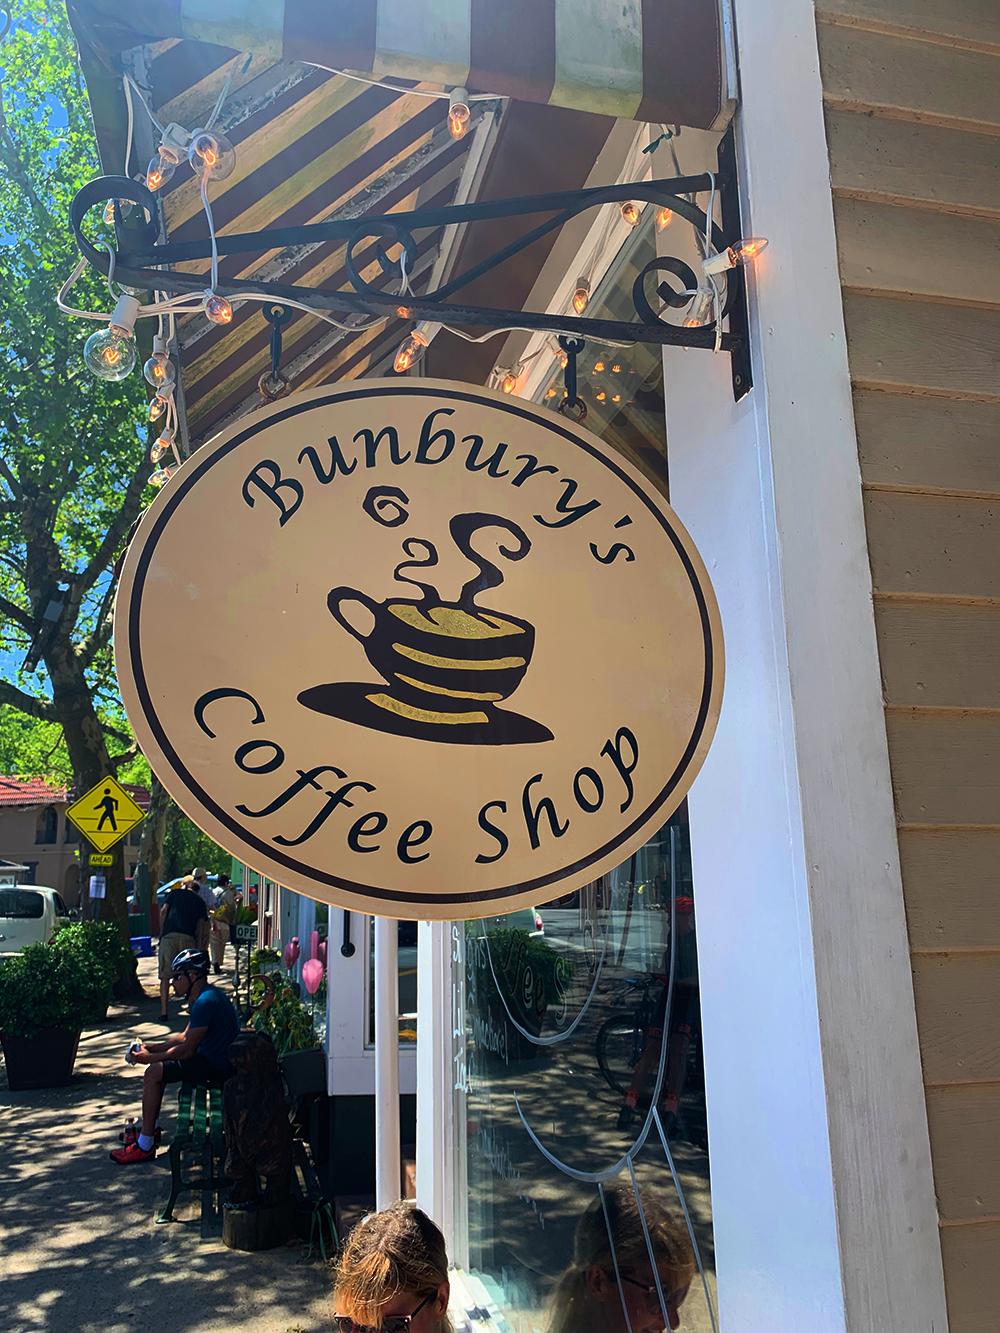 walking-in-piermont-ny-bunbury's-coffee.jpg